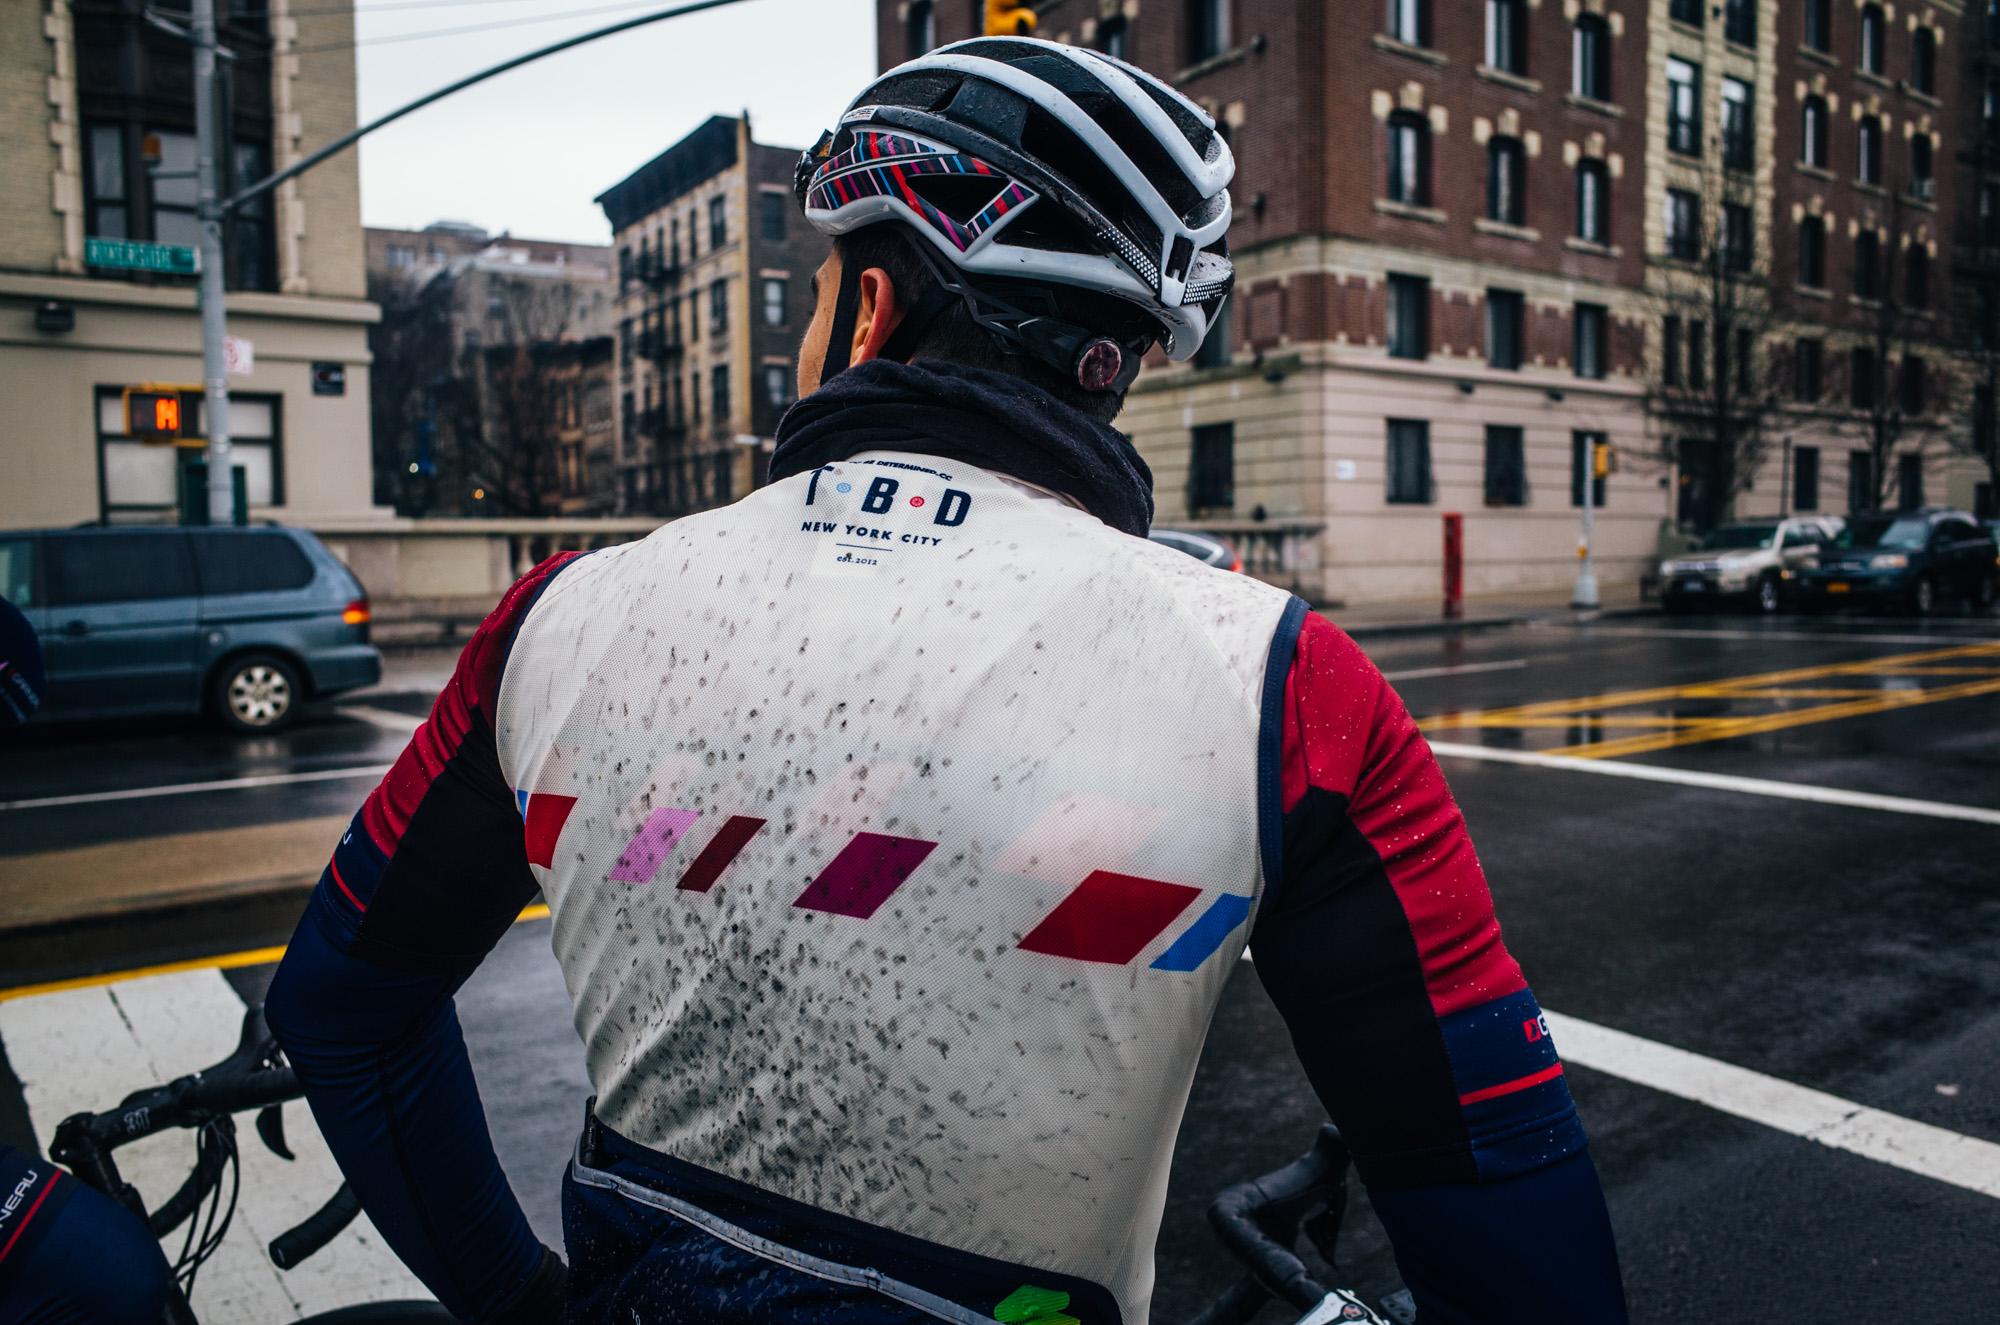 to-be-determined-photo-rhetoric-weekend-roll-lisa-bday-ride-115.jpg